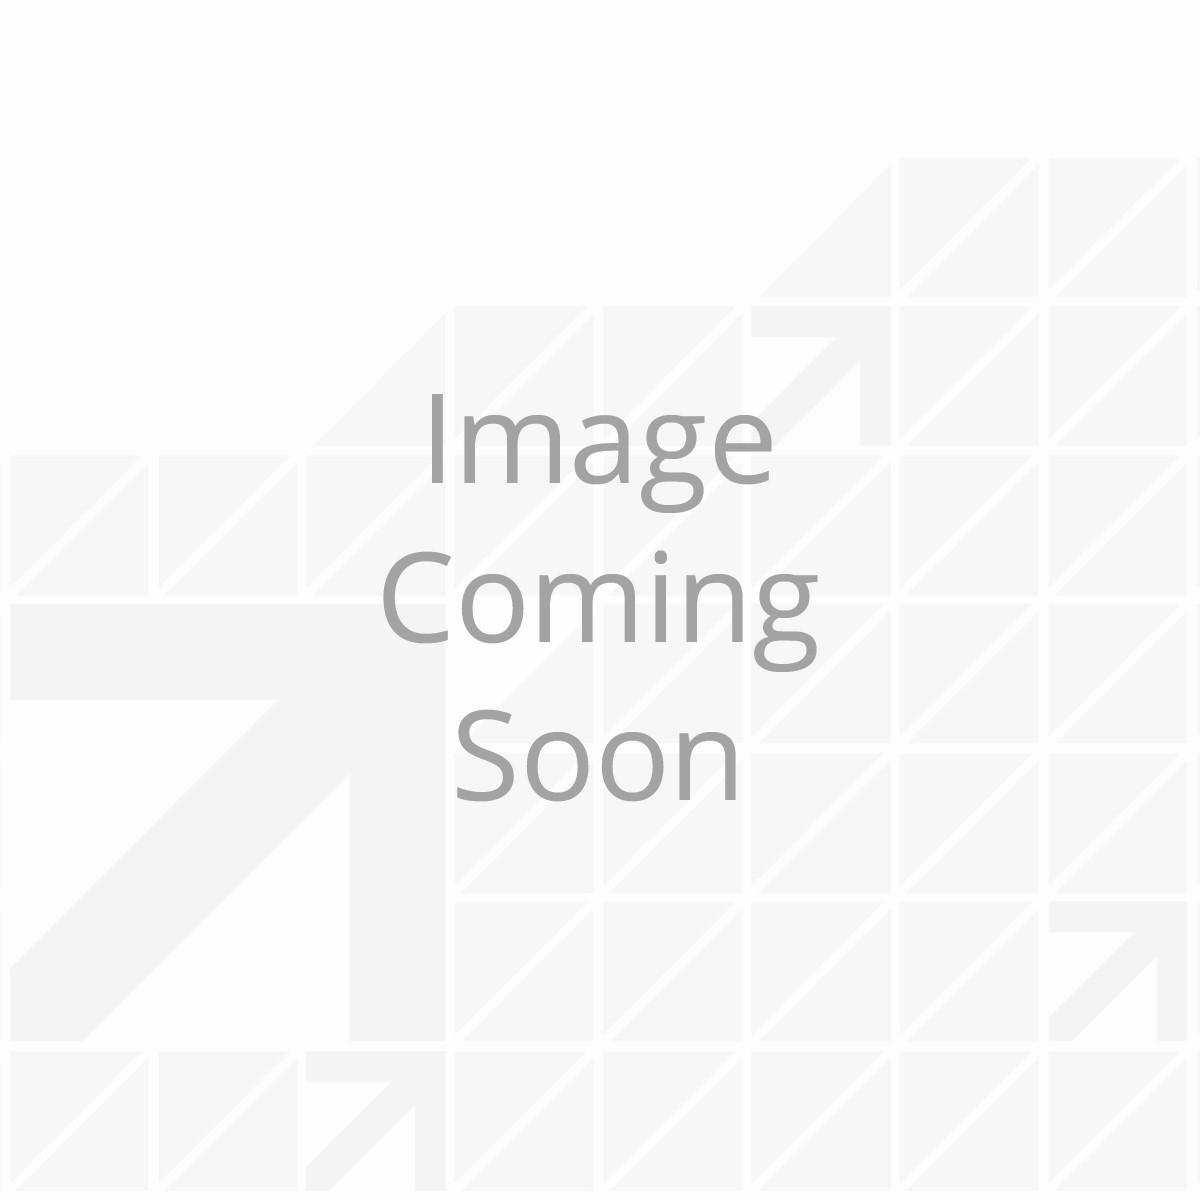 "SecureLatch Lunette Ring & Channel (40,000 lbs, 3"" ID, 11-3/4"" Channel Height)"